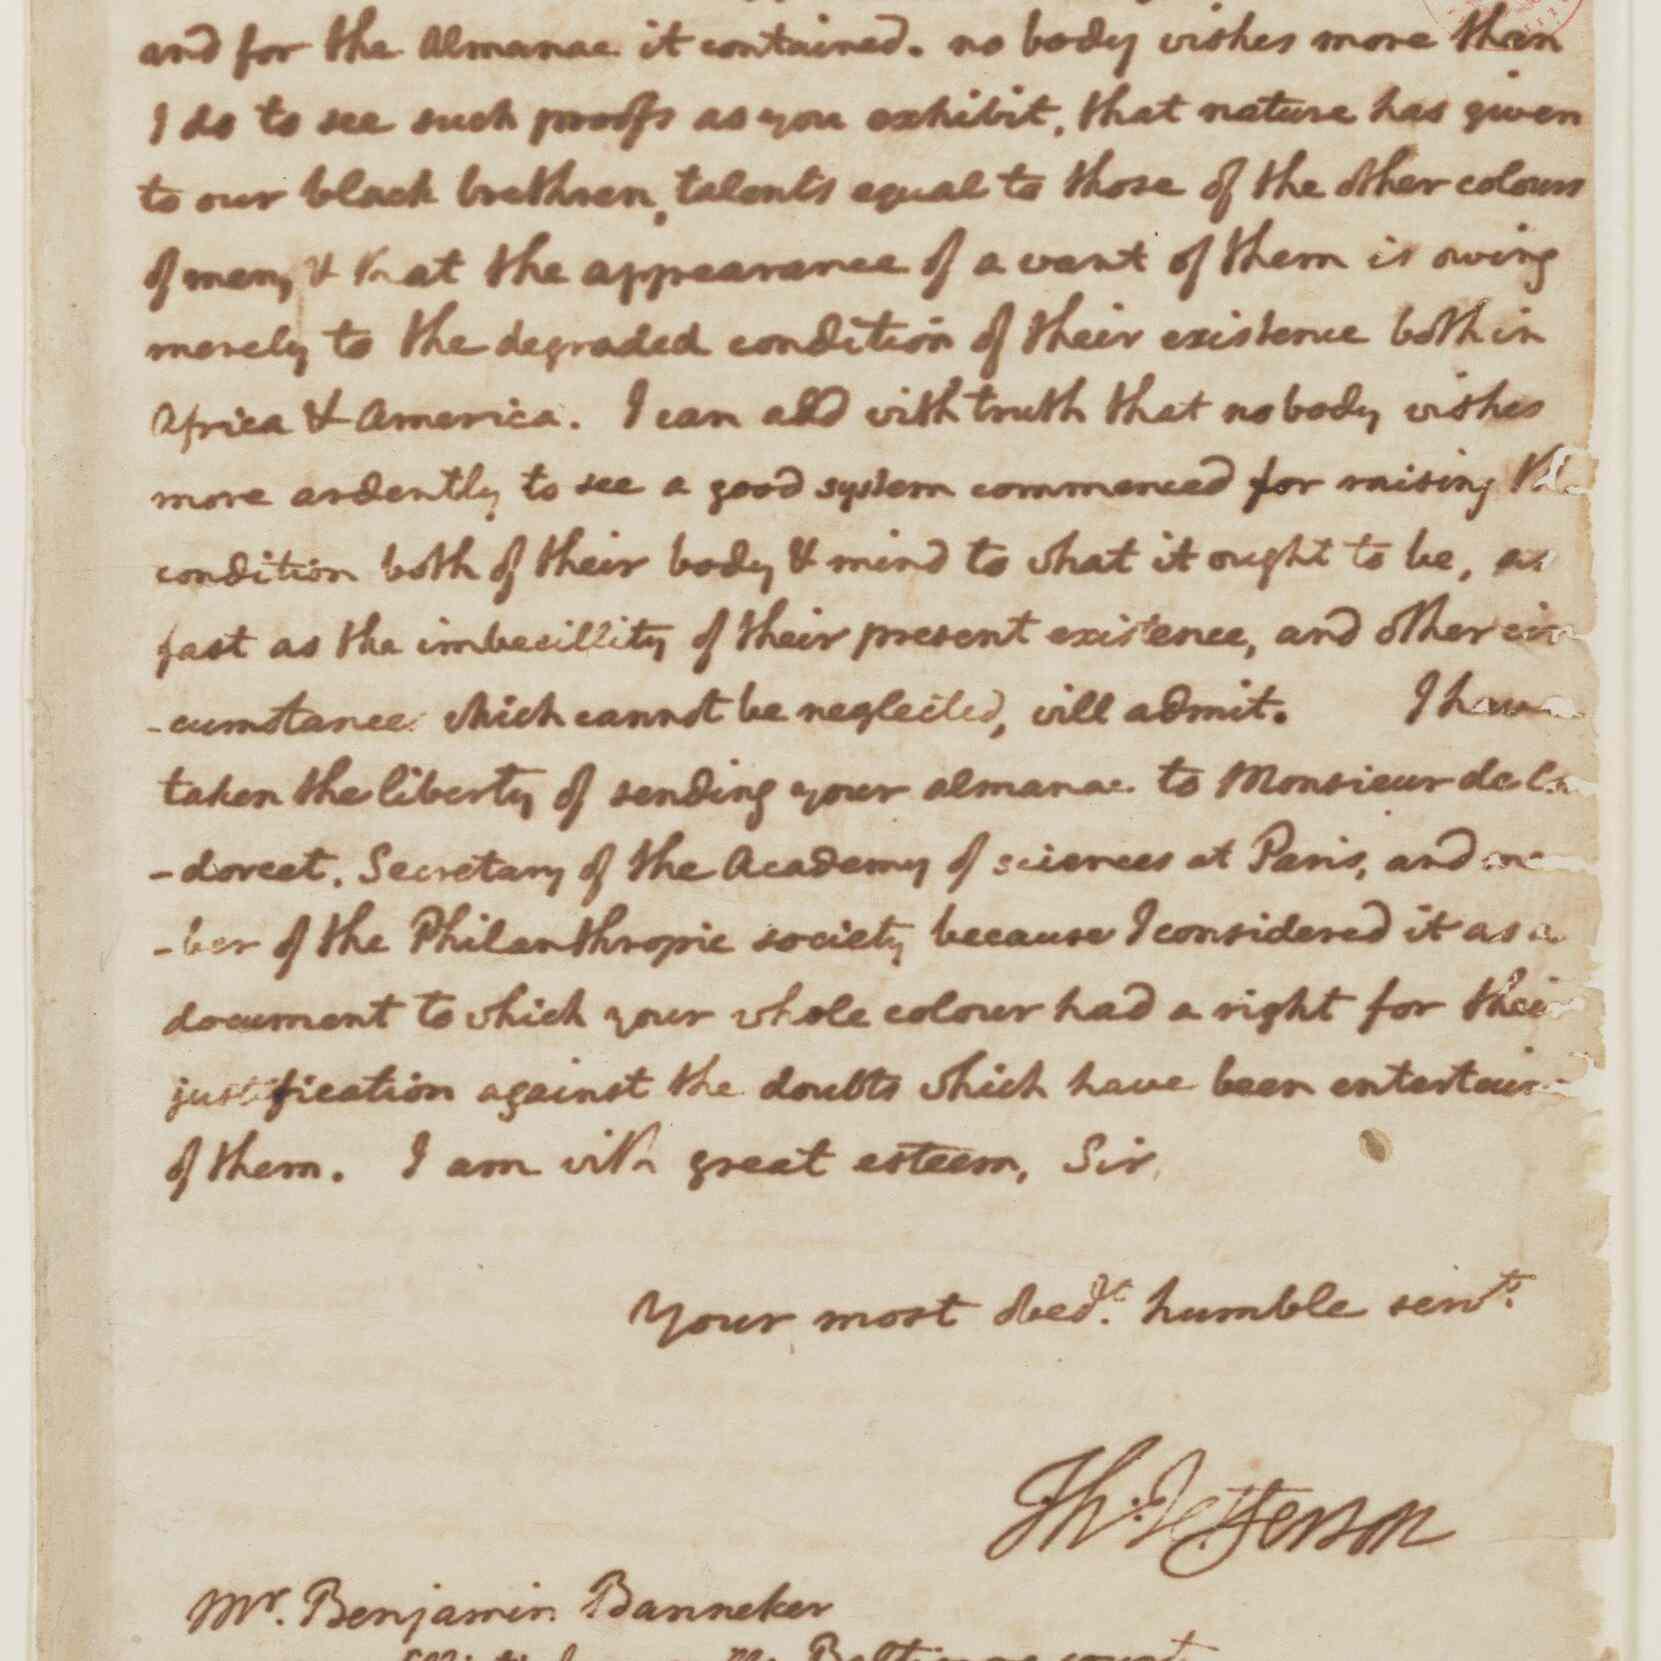 Thomas Jefferson's 1791 letter to Benjamin Banneker